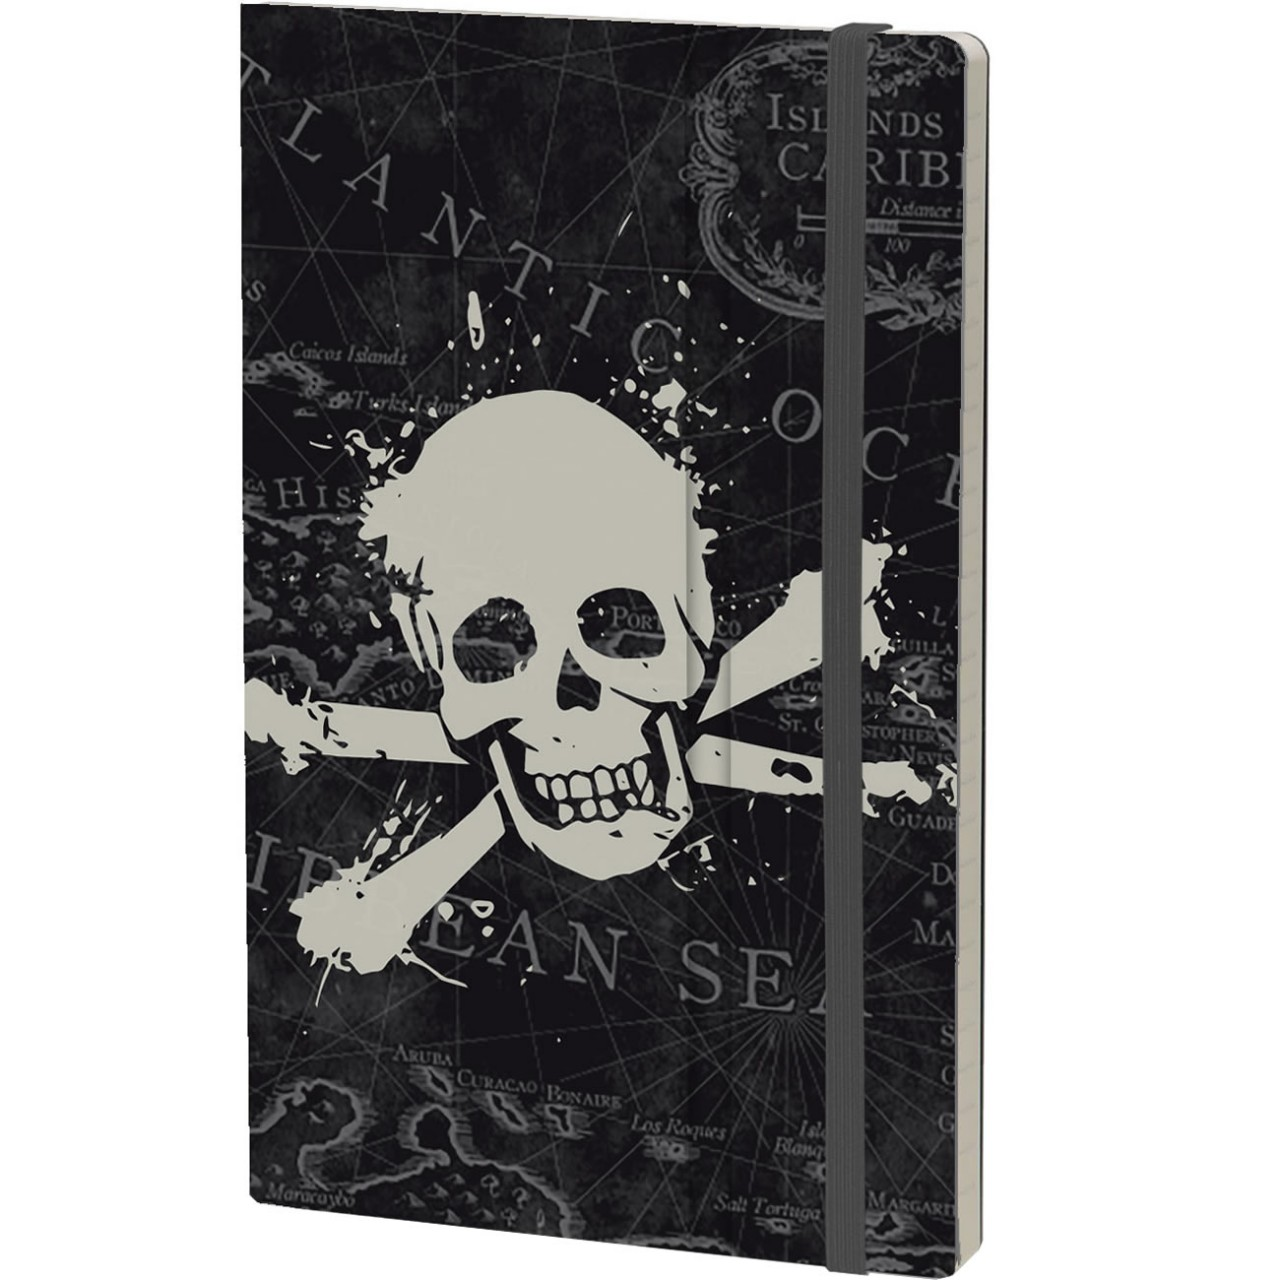 Stifflexible Notizbuch HISTORICAL NOTES 13 x 21 cm 192 S., Pocket/Bookmark, Elastic closure, JOLLY ROGER (Pirate Flag)